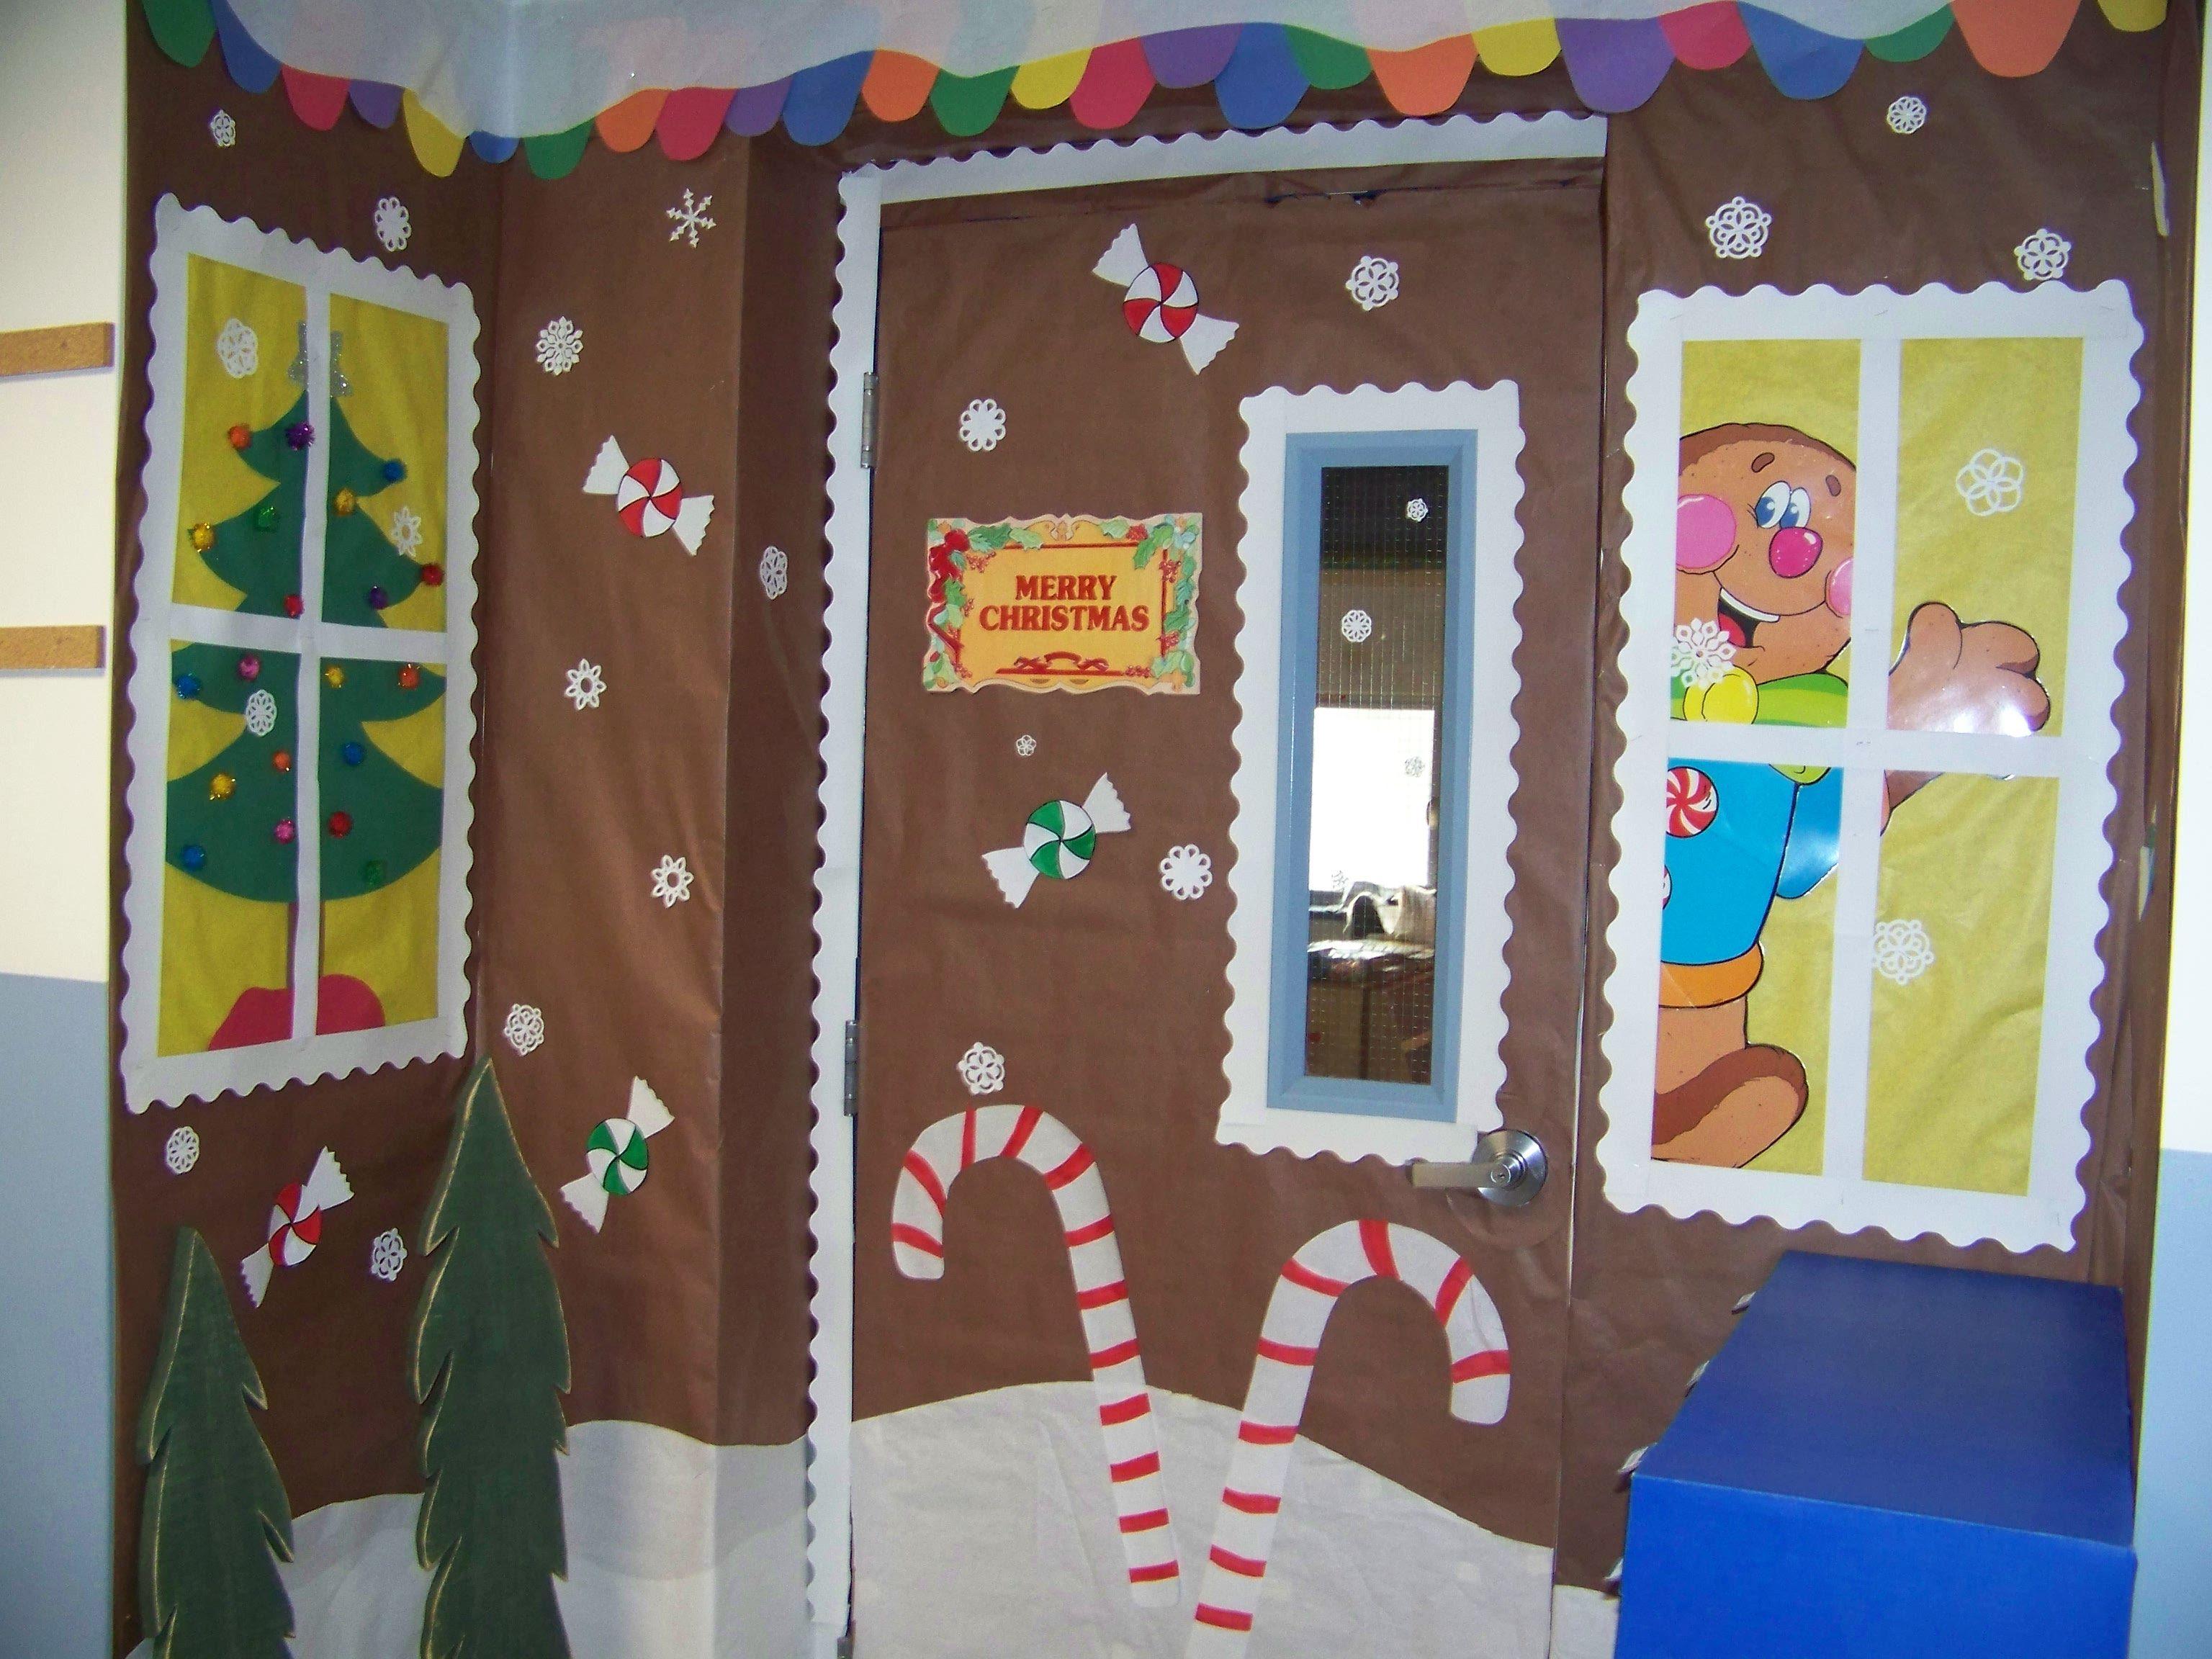 This Is My Classroom Door Gingerbread House It Took Me 6